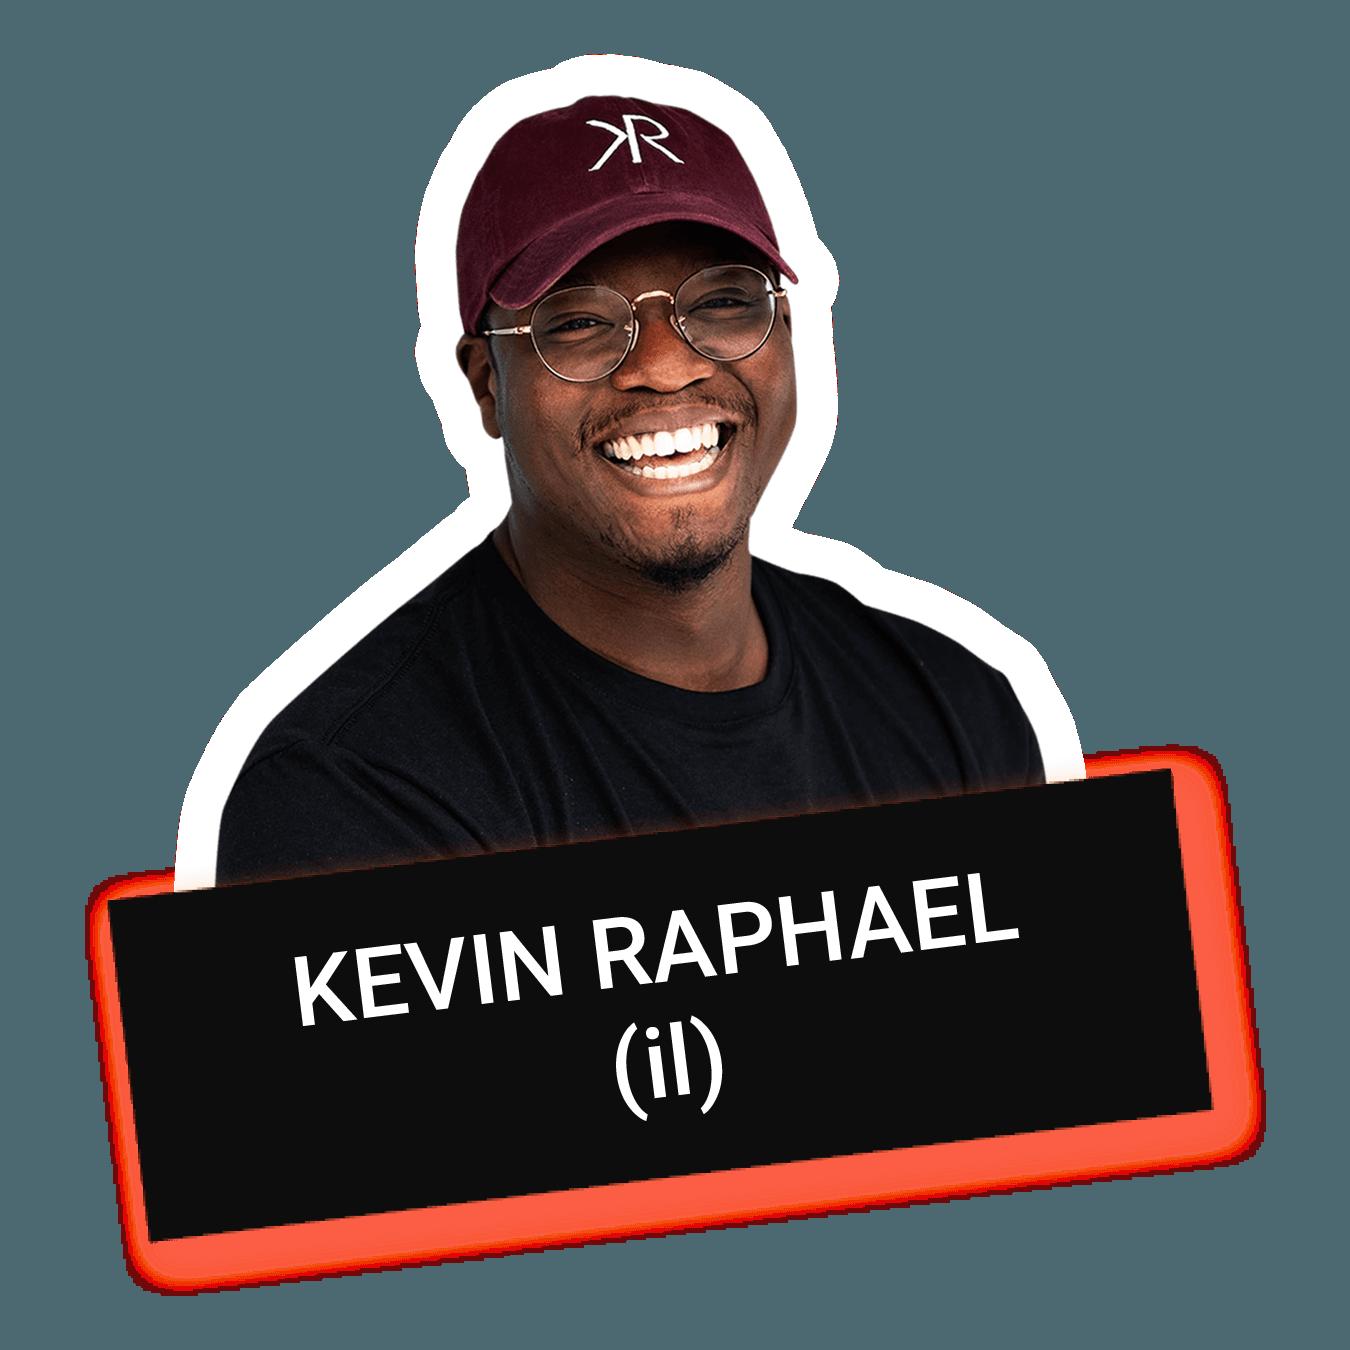 Kevin Raphael